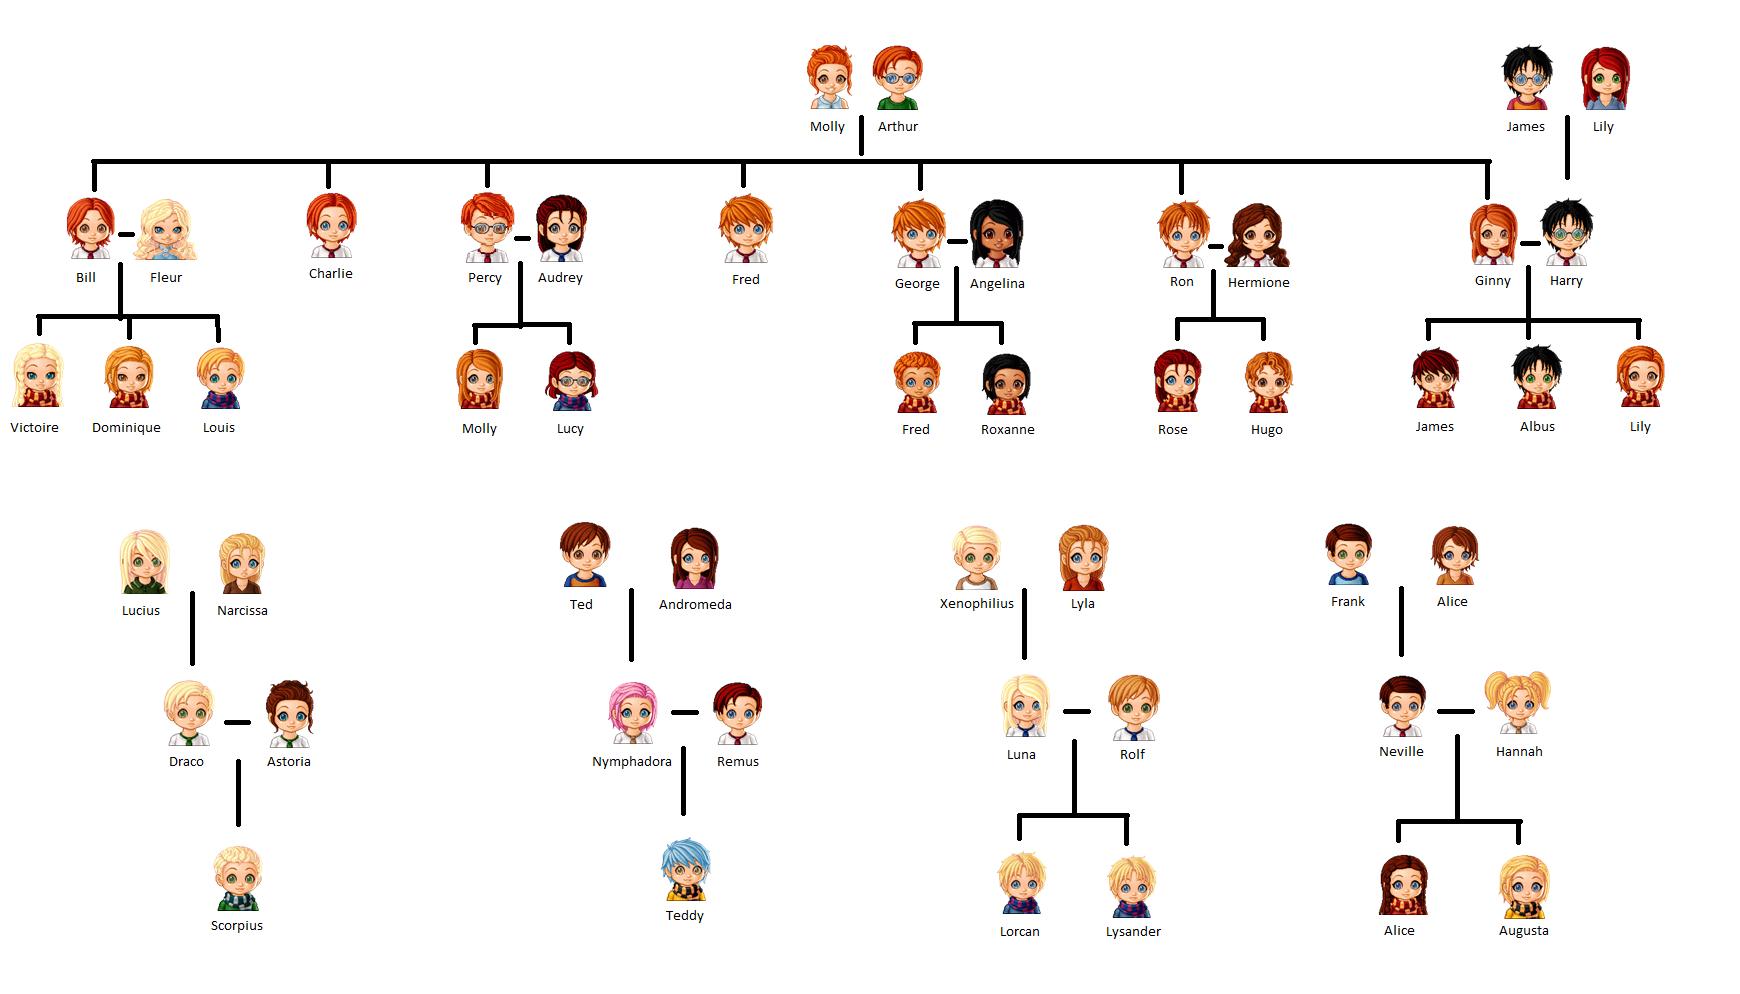 Next Generation Harry Potter Next Generation Harry Potter Family Tree Harry Potter Universal